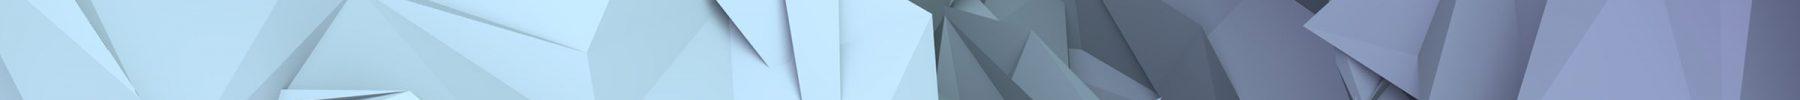 abstract-glitch-digital-art